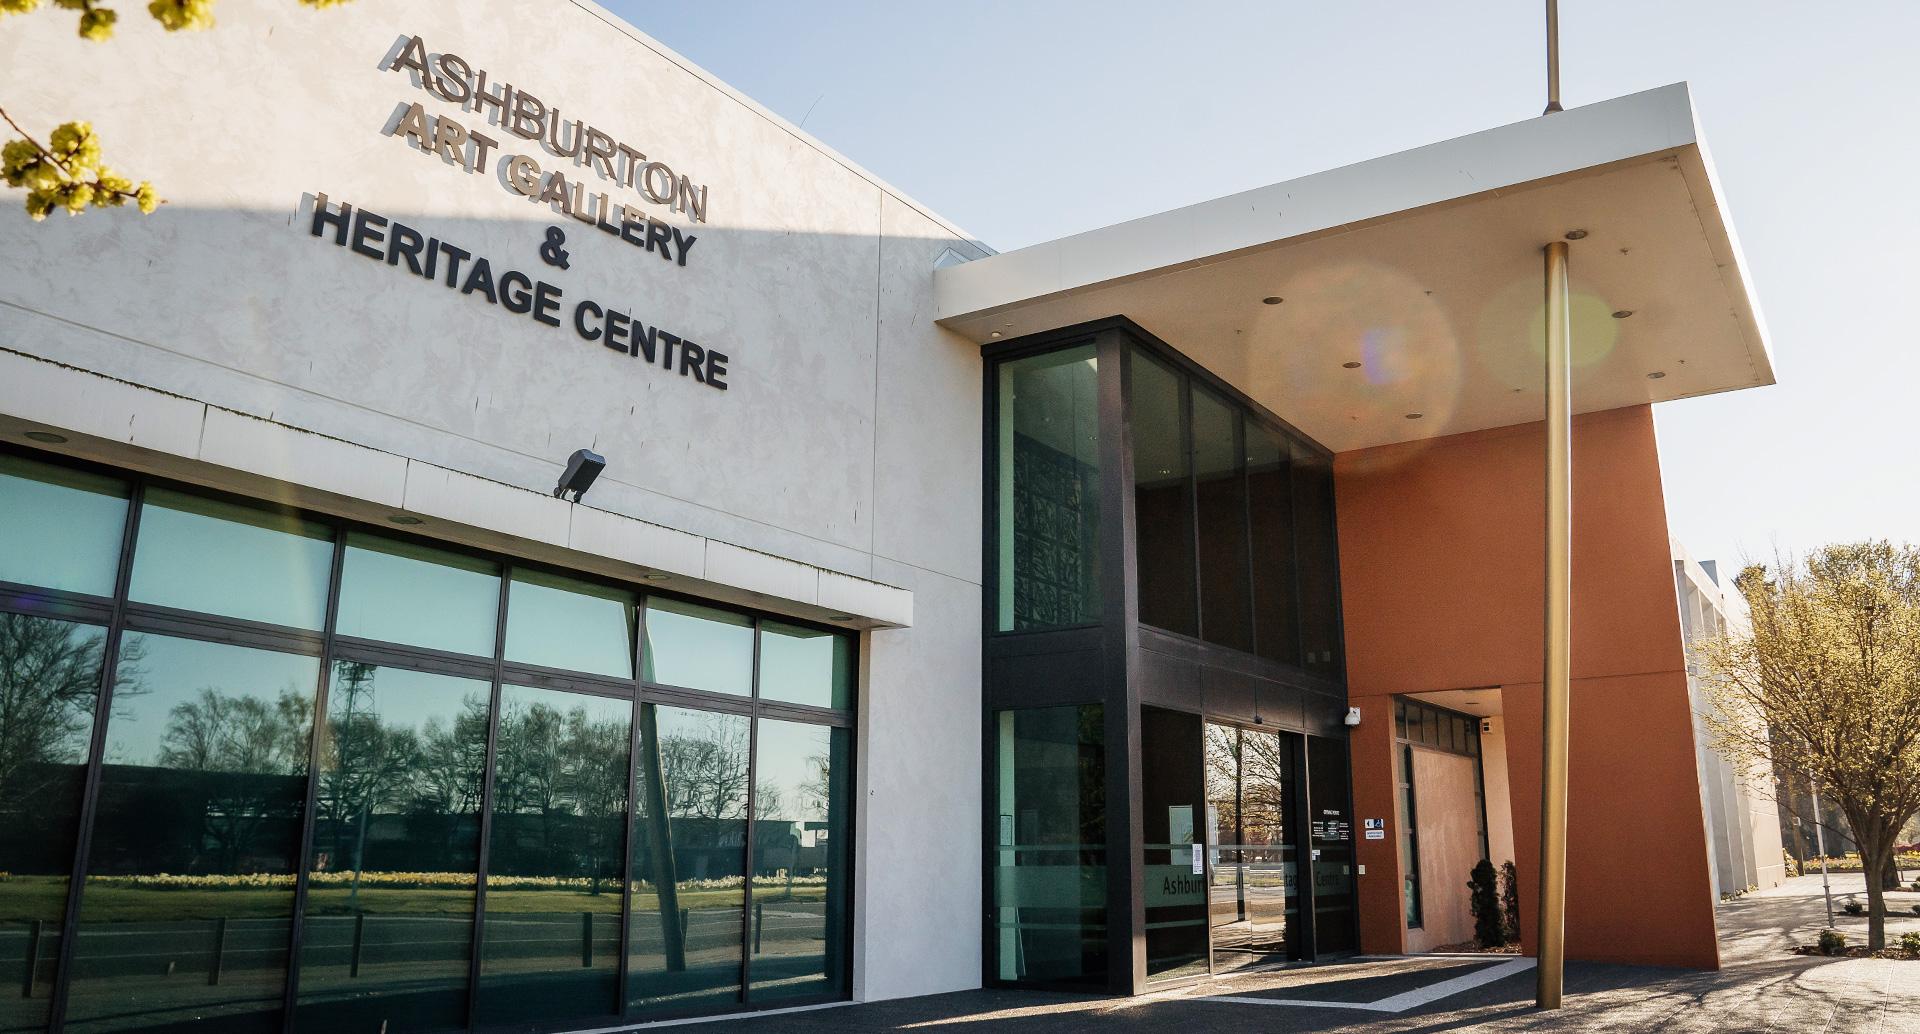 Art Gallery & Heritage Centre